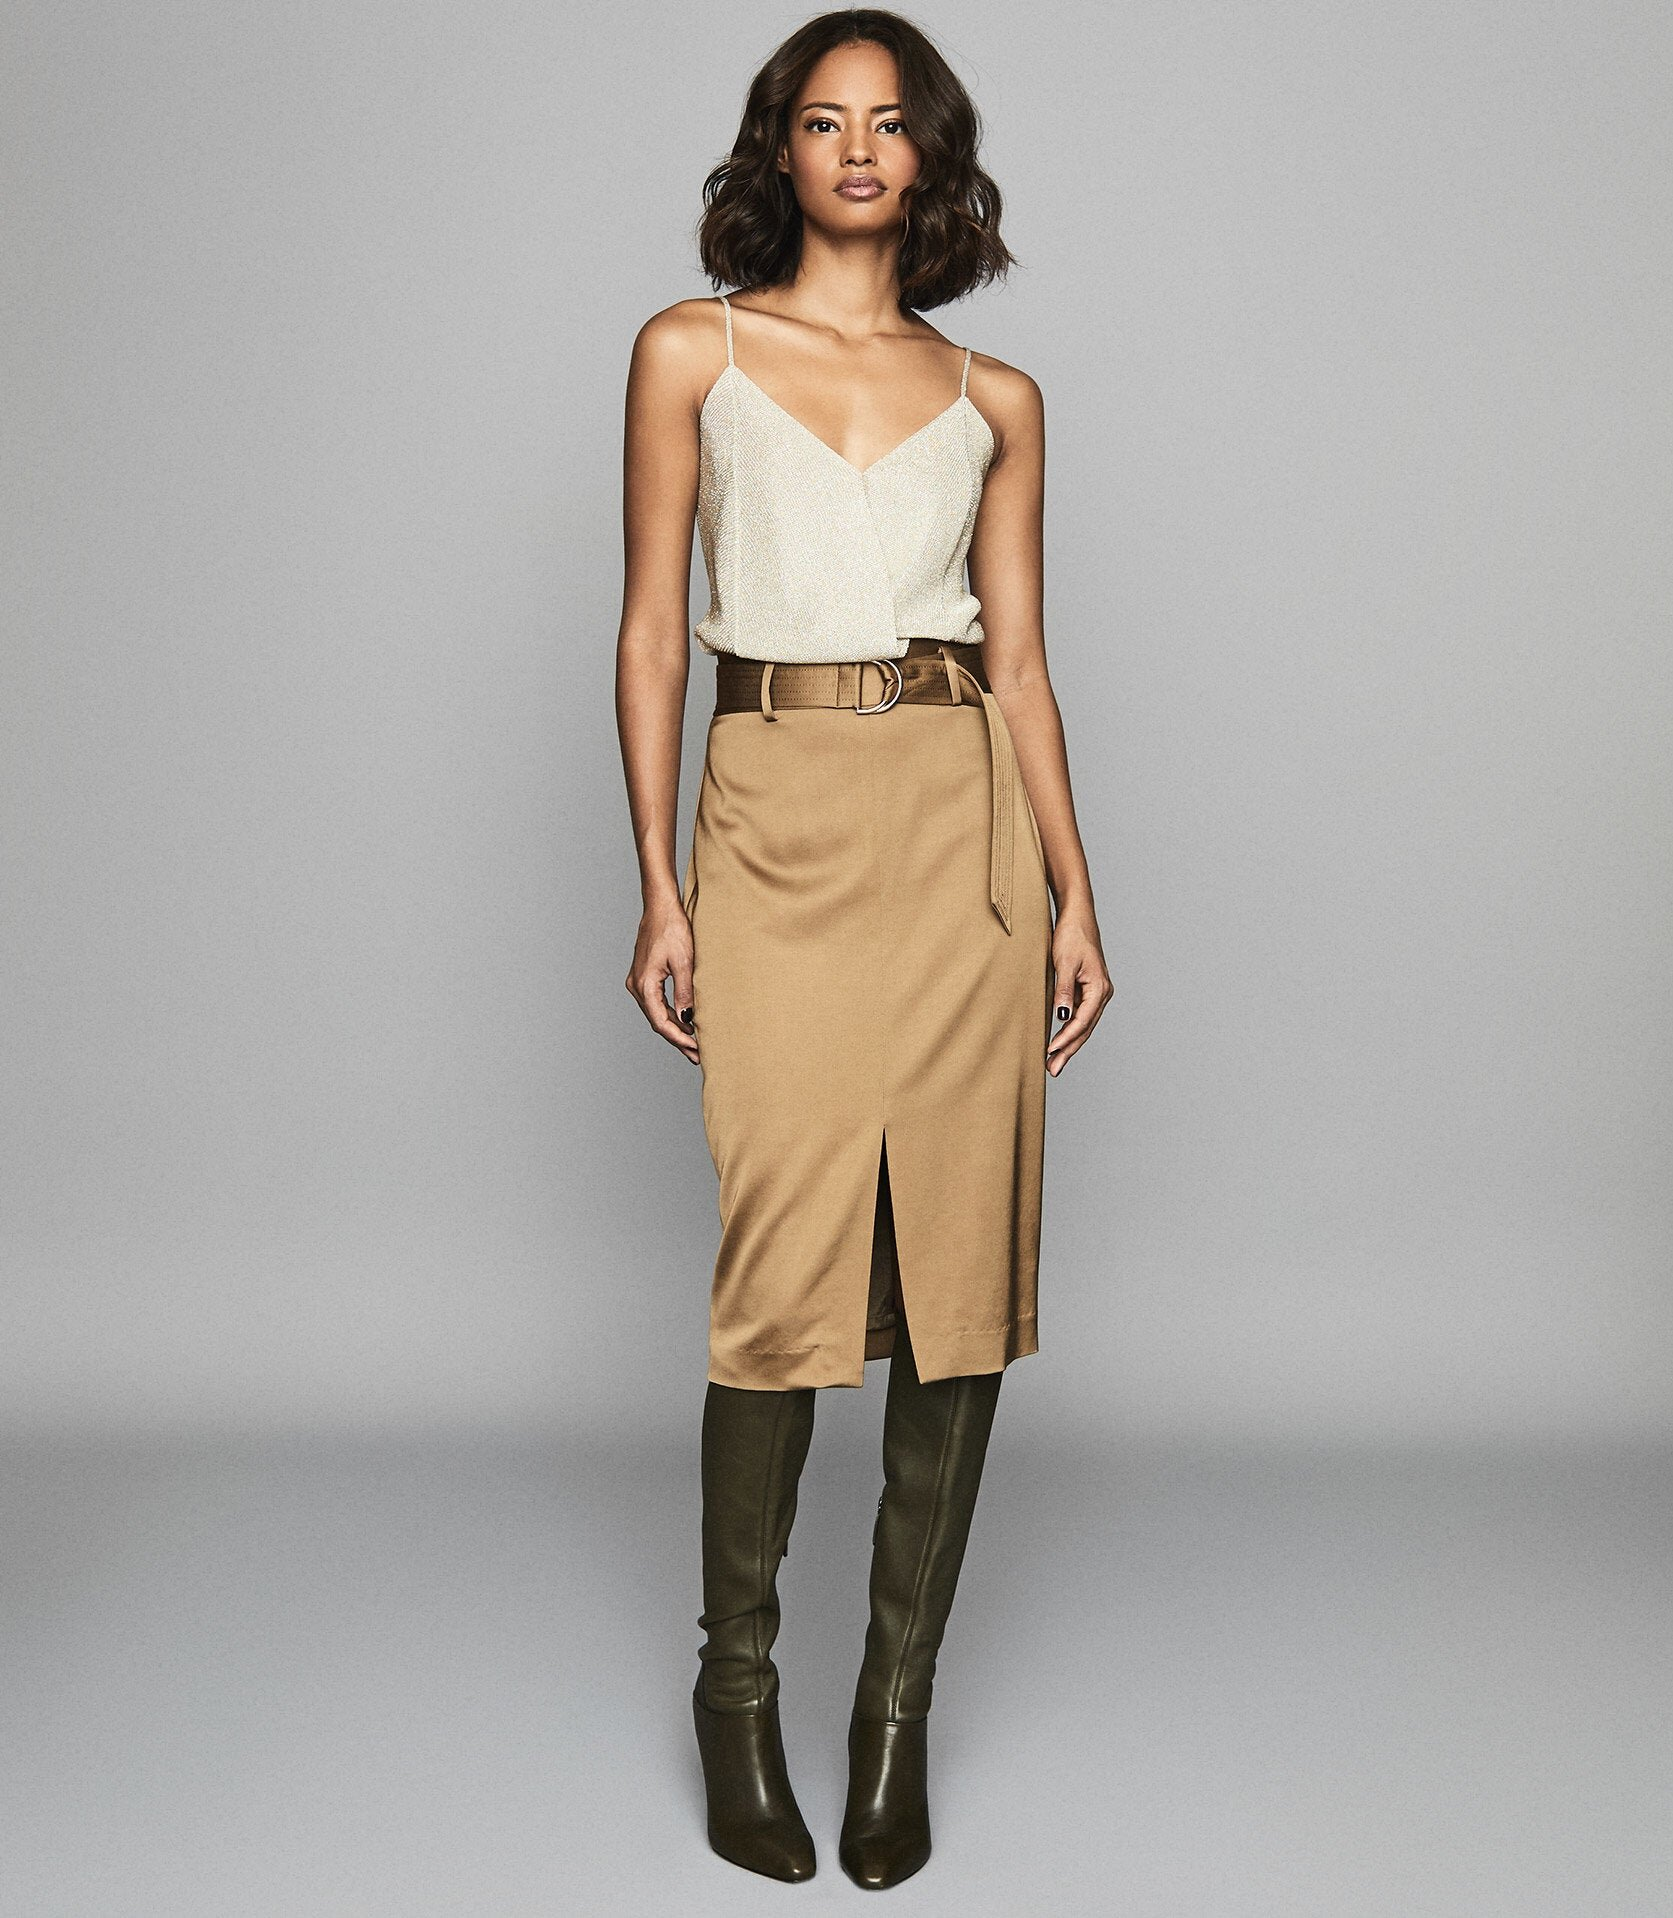 Reiss Bryn - Satin Belted Midi Skirt in Gold